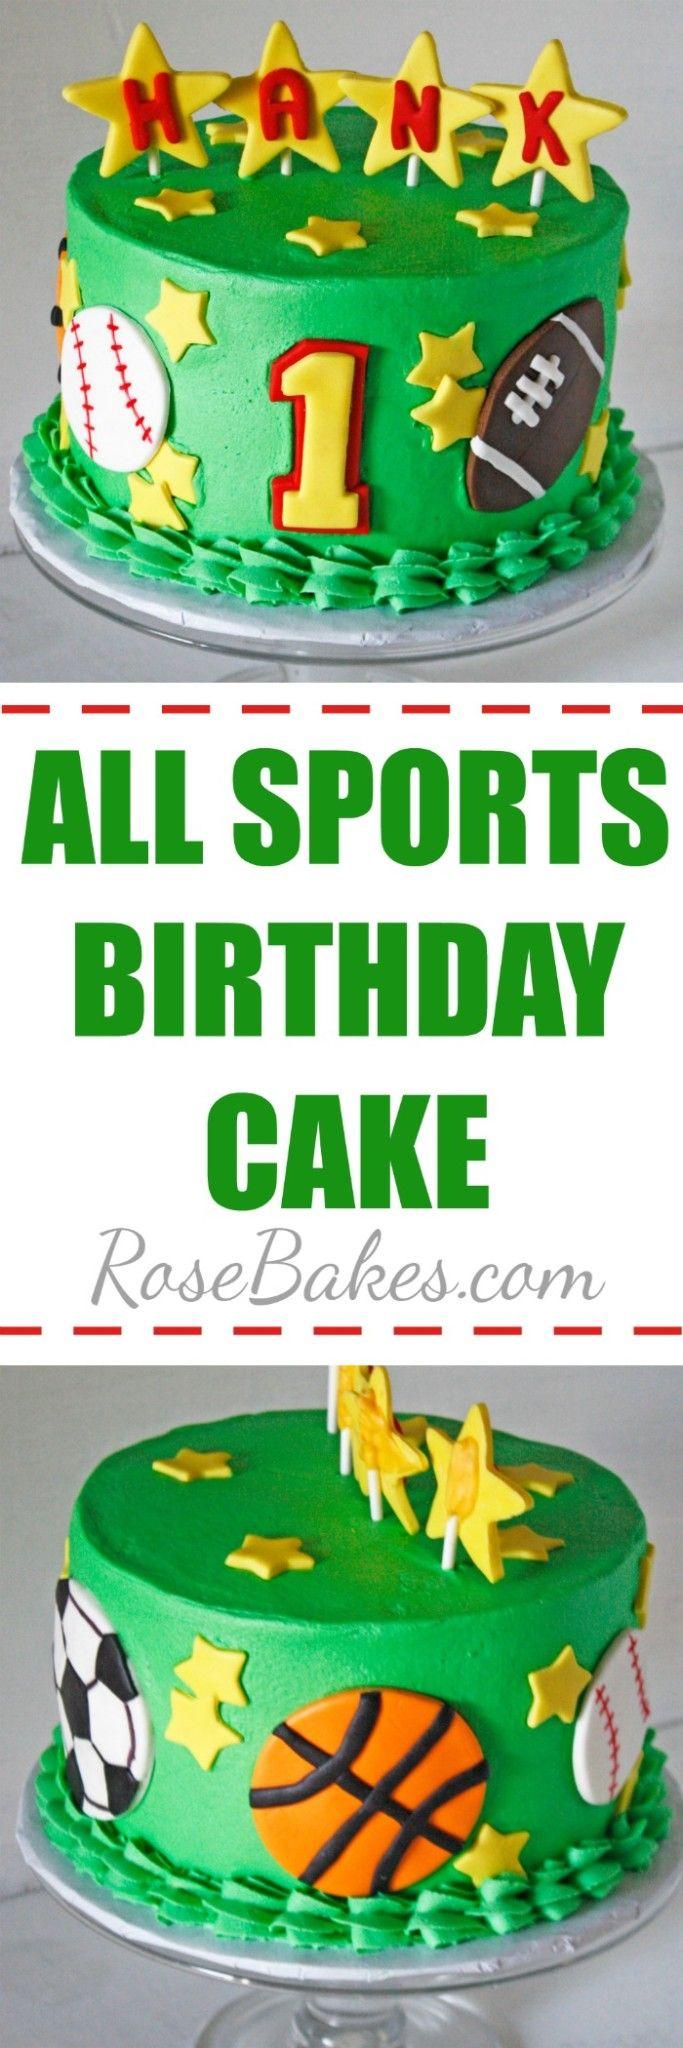 All Sports Birthday Cake by RoseBakes